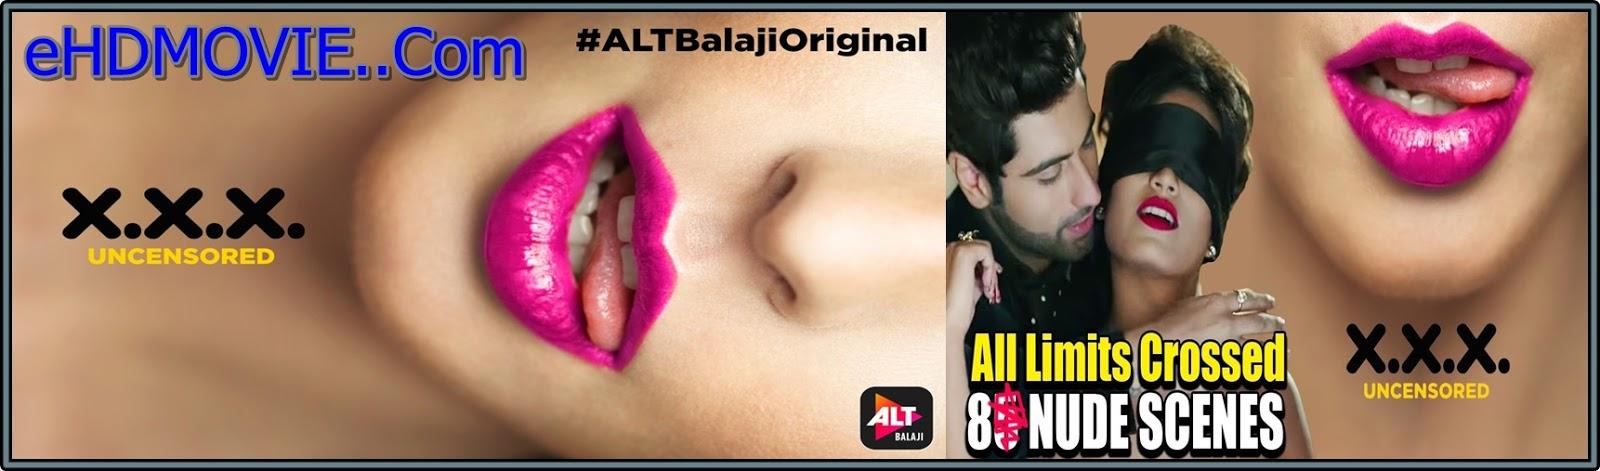 XXX UNCENSORED Alt Balaji Season 1 2018 Bengali Web Series All Episode Original 480p - 720p ORG WEB-DL 450MB - 650MB - 900MB